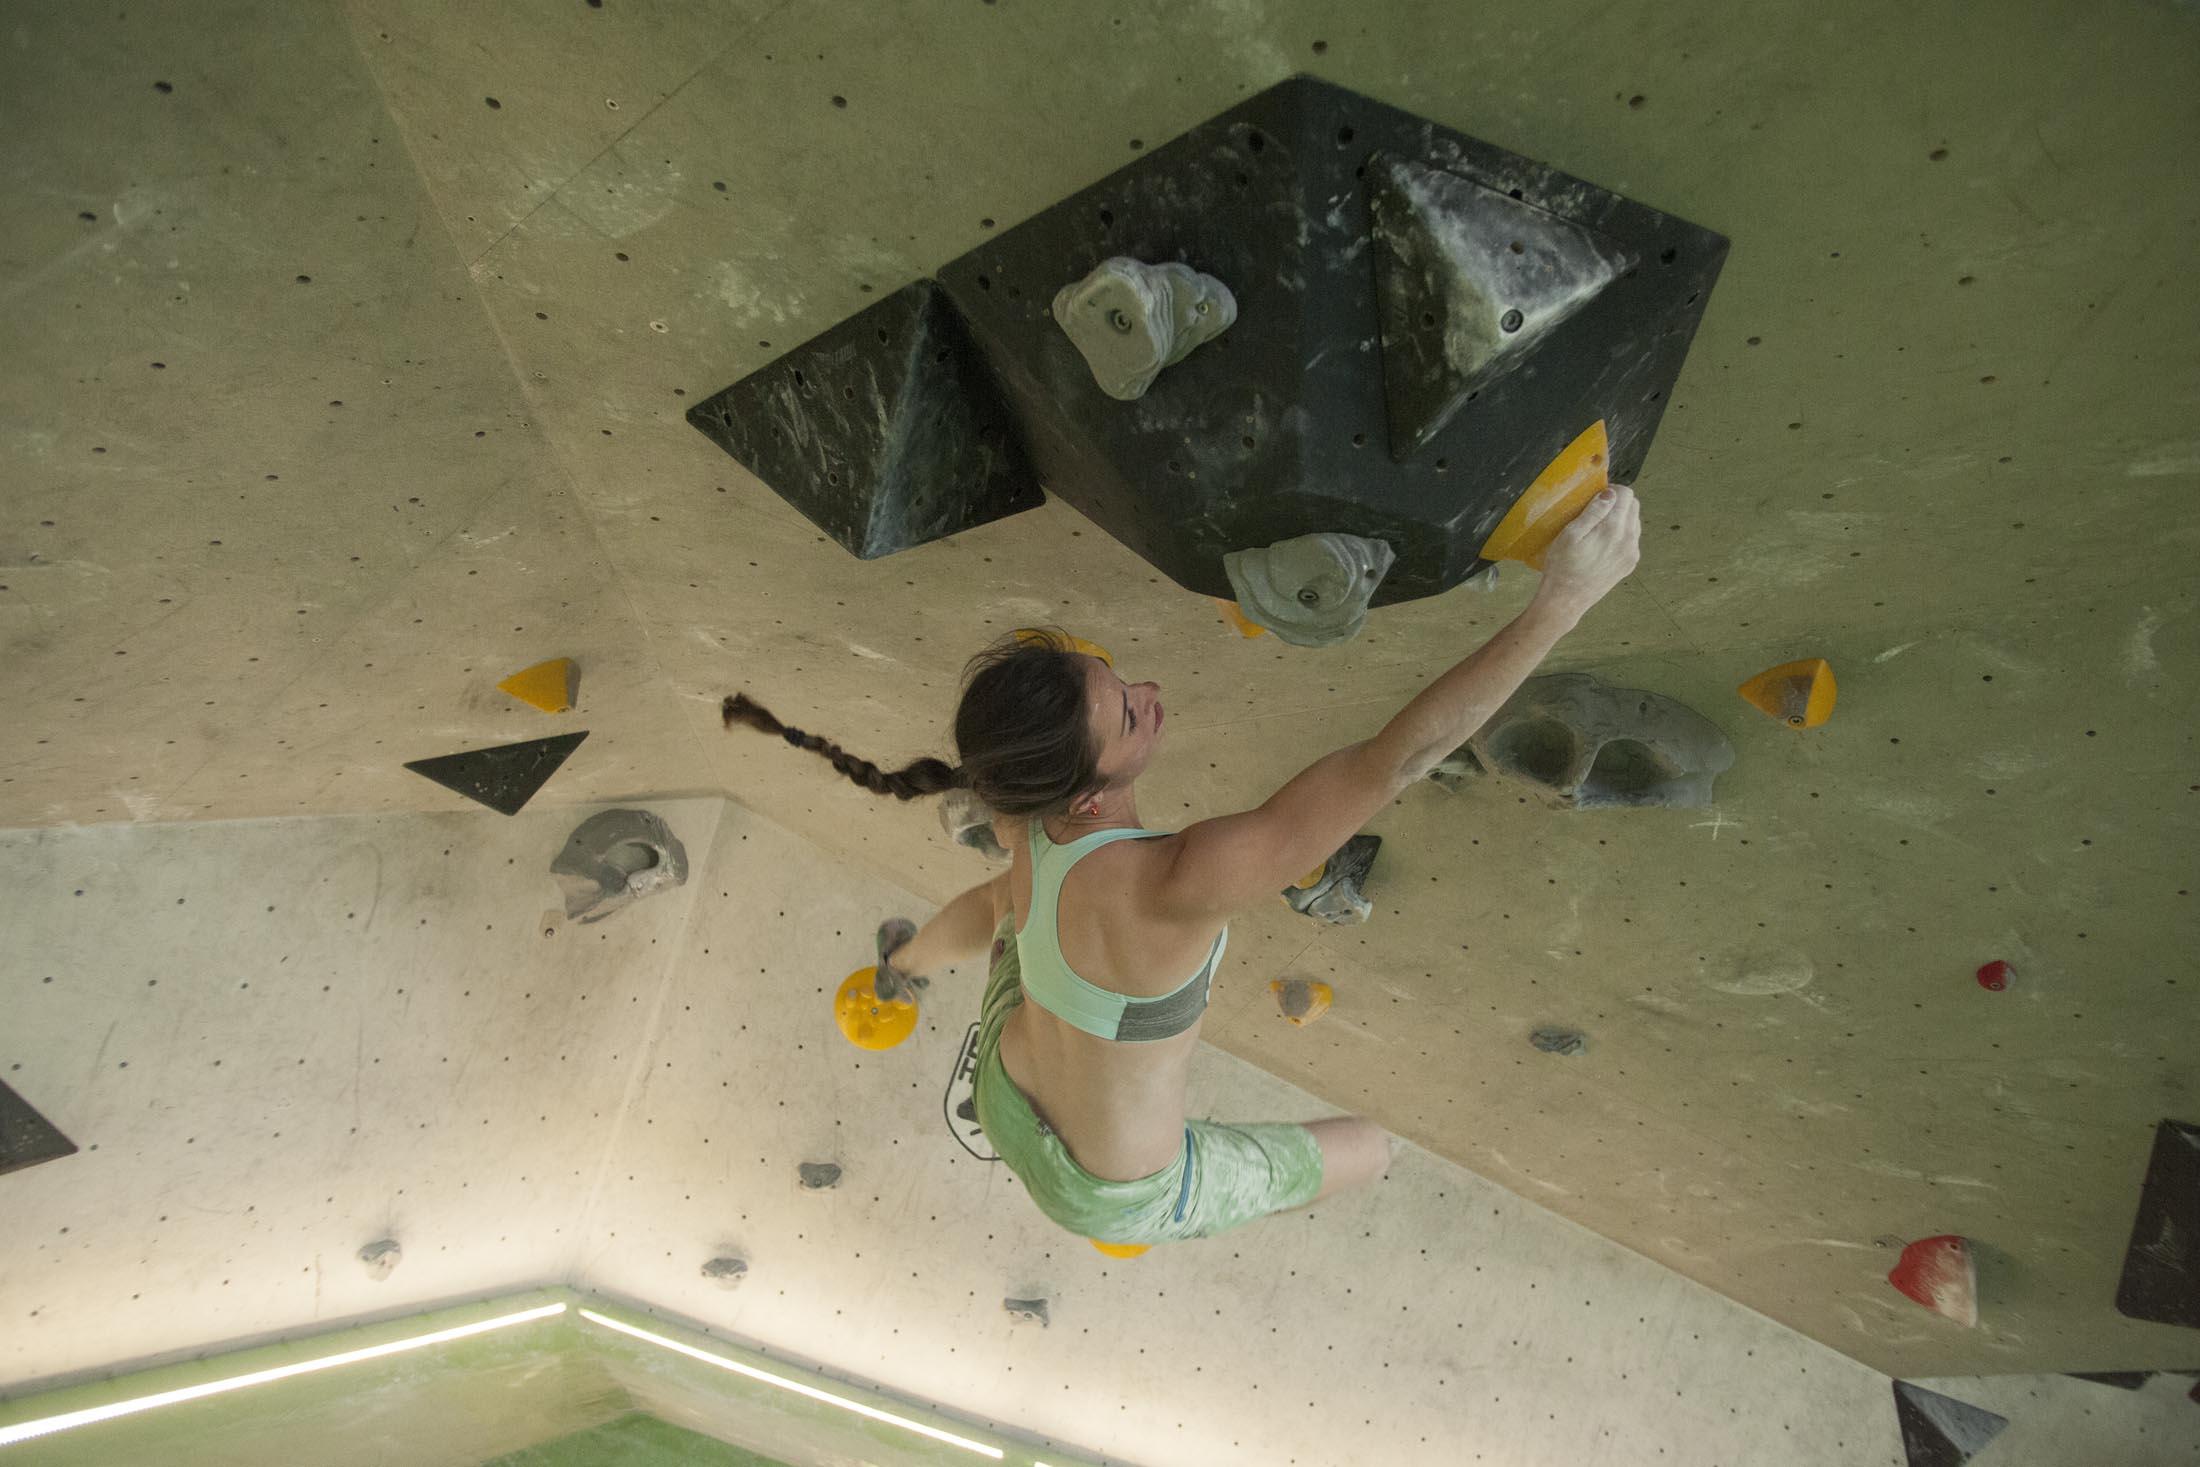 Juliane Wurm, internationaler bouldercup Frankenjura, BLOCKHELDEN Erlangen, Bergfreunde.de, Mammut07092016026